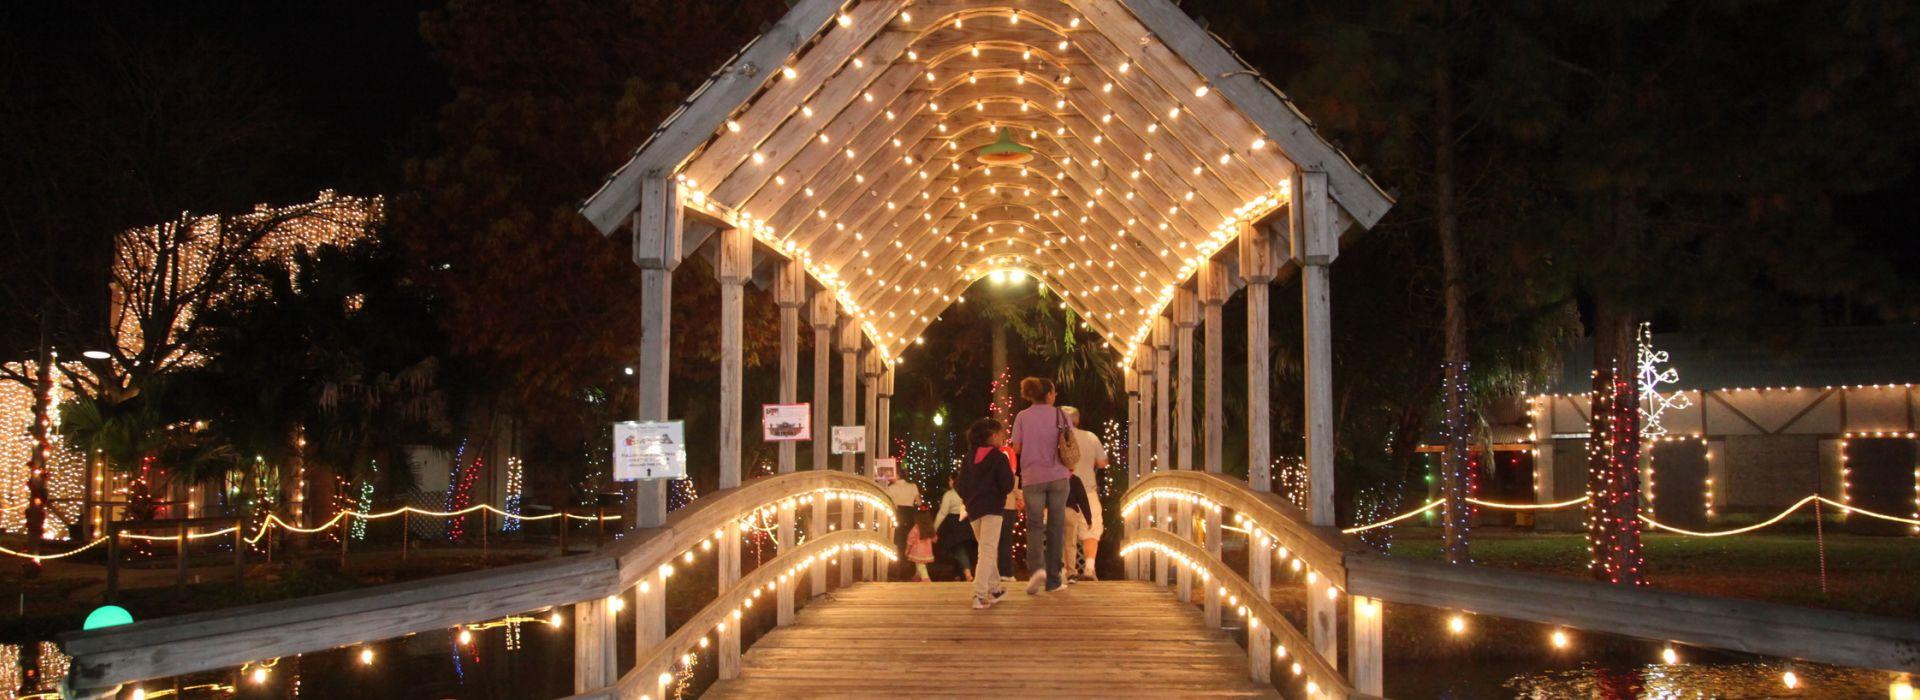 Kenner Christmas Village Visit Jefferson Parish